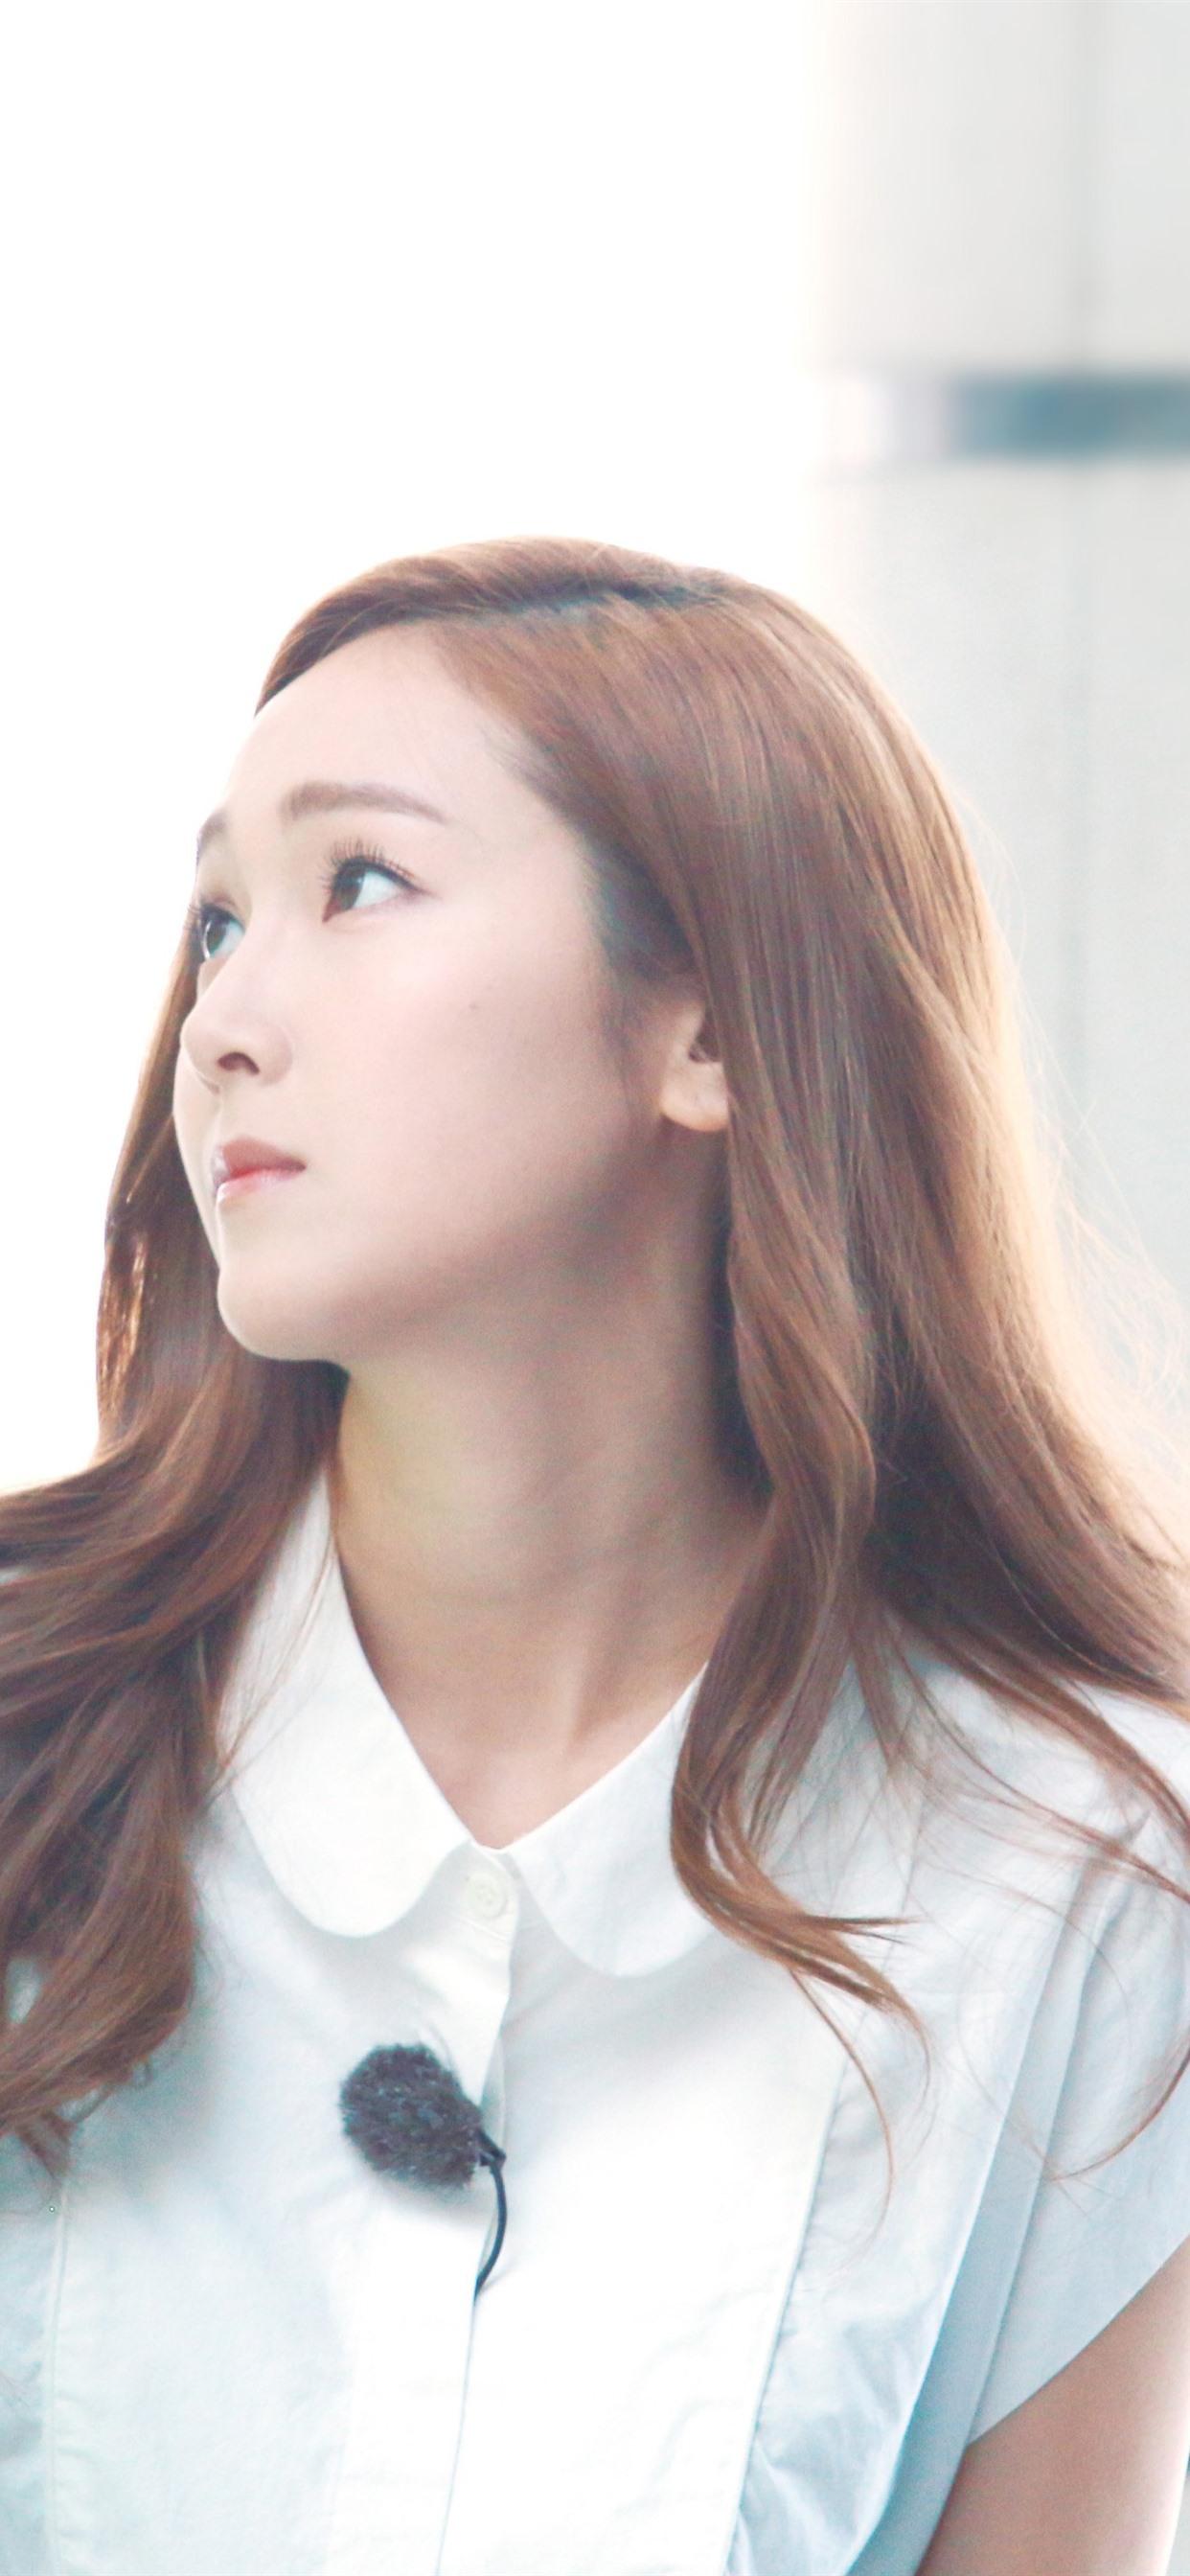 Kim Taeyeon Snsd Korean Girl 1242x2688 Iphone 11 Pro Xs Max Wallpaper Background Picture Image